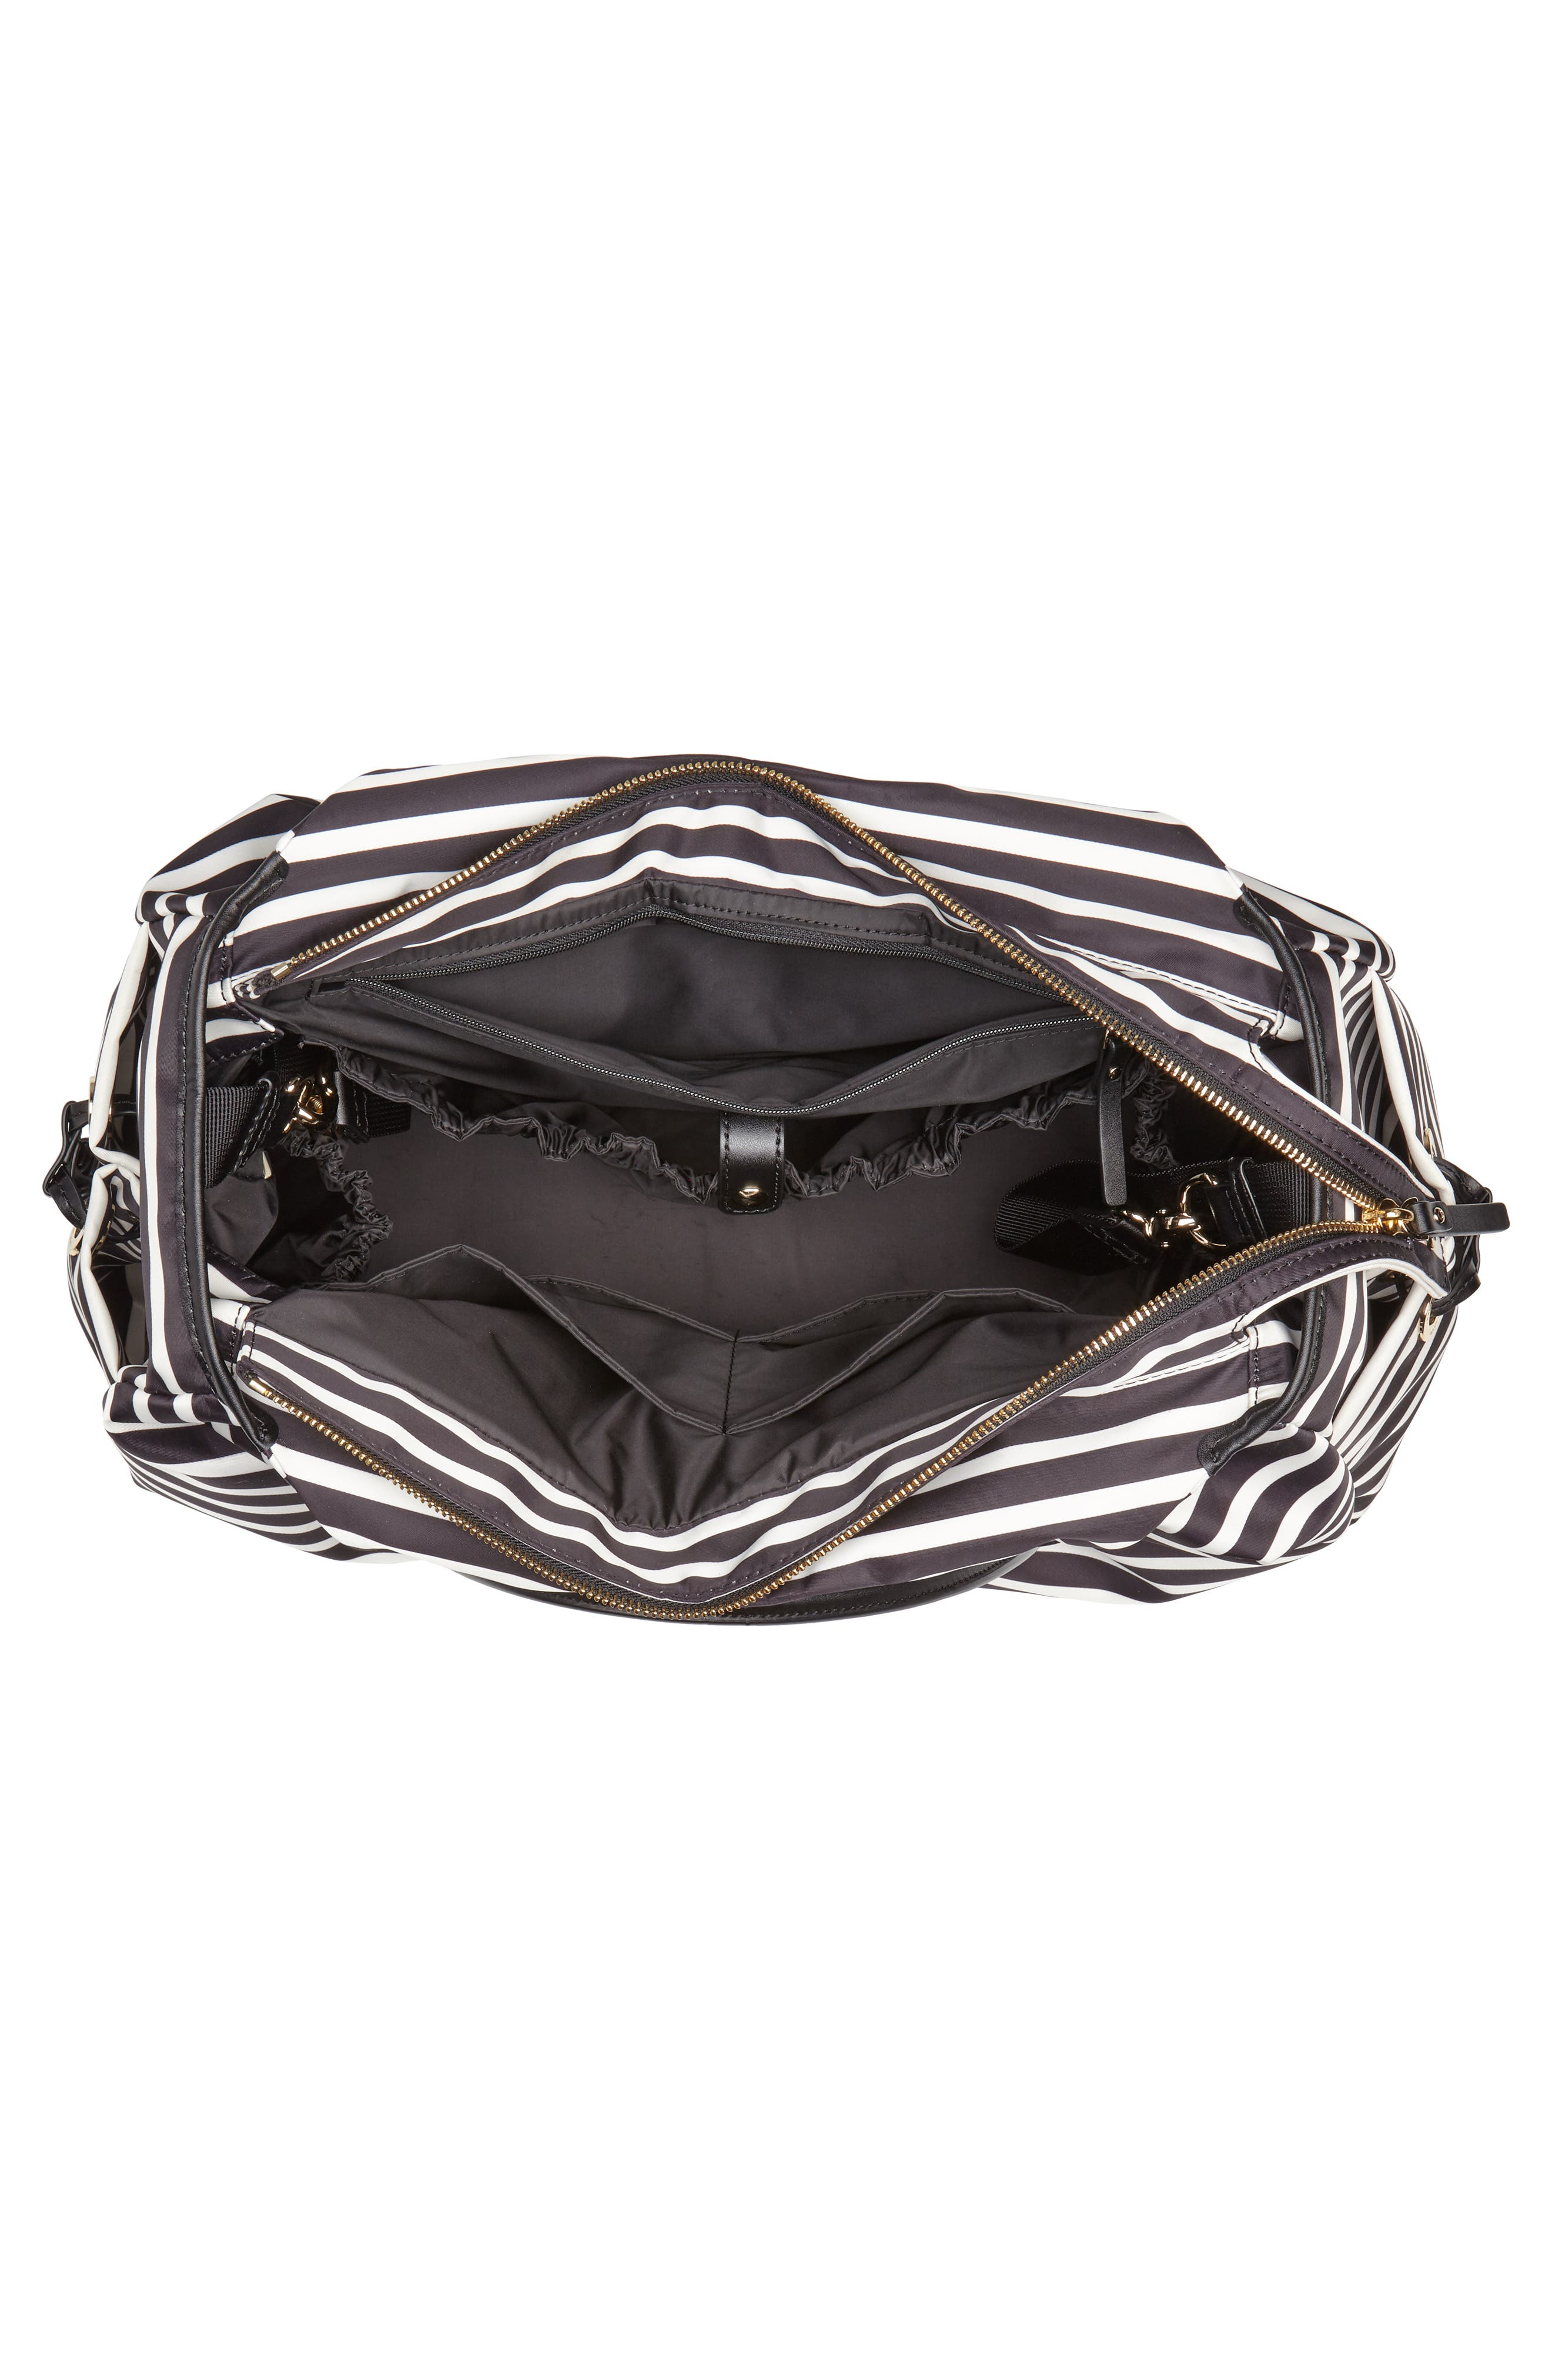 watson lane - stevie diaper bag,                             Alternate thumbnail 4, color,                             BLACK/ CLOTTED CREAM